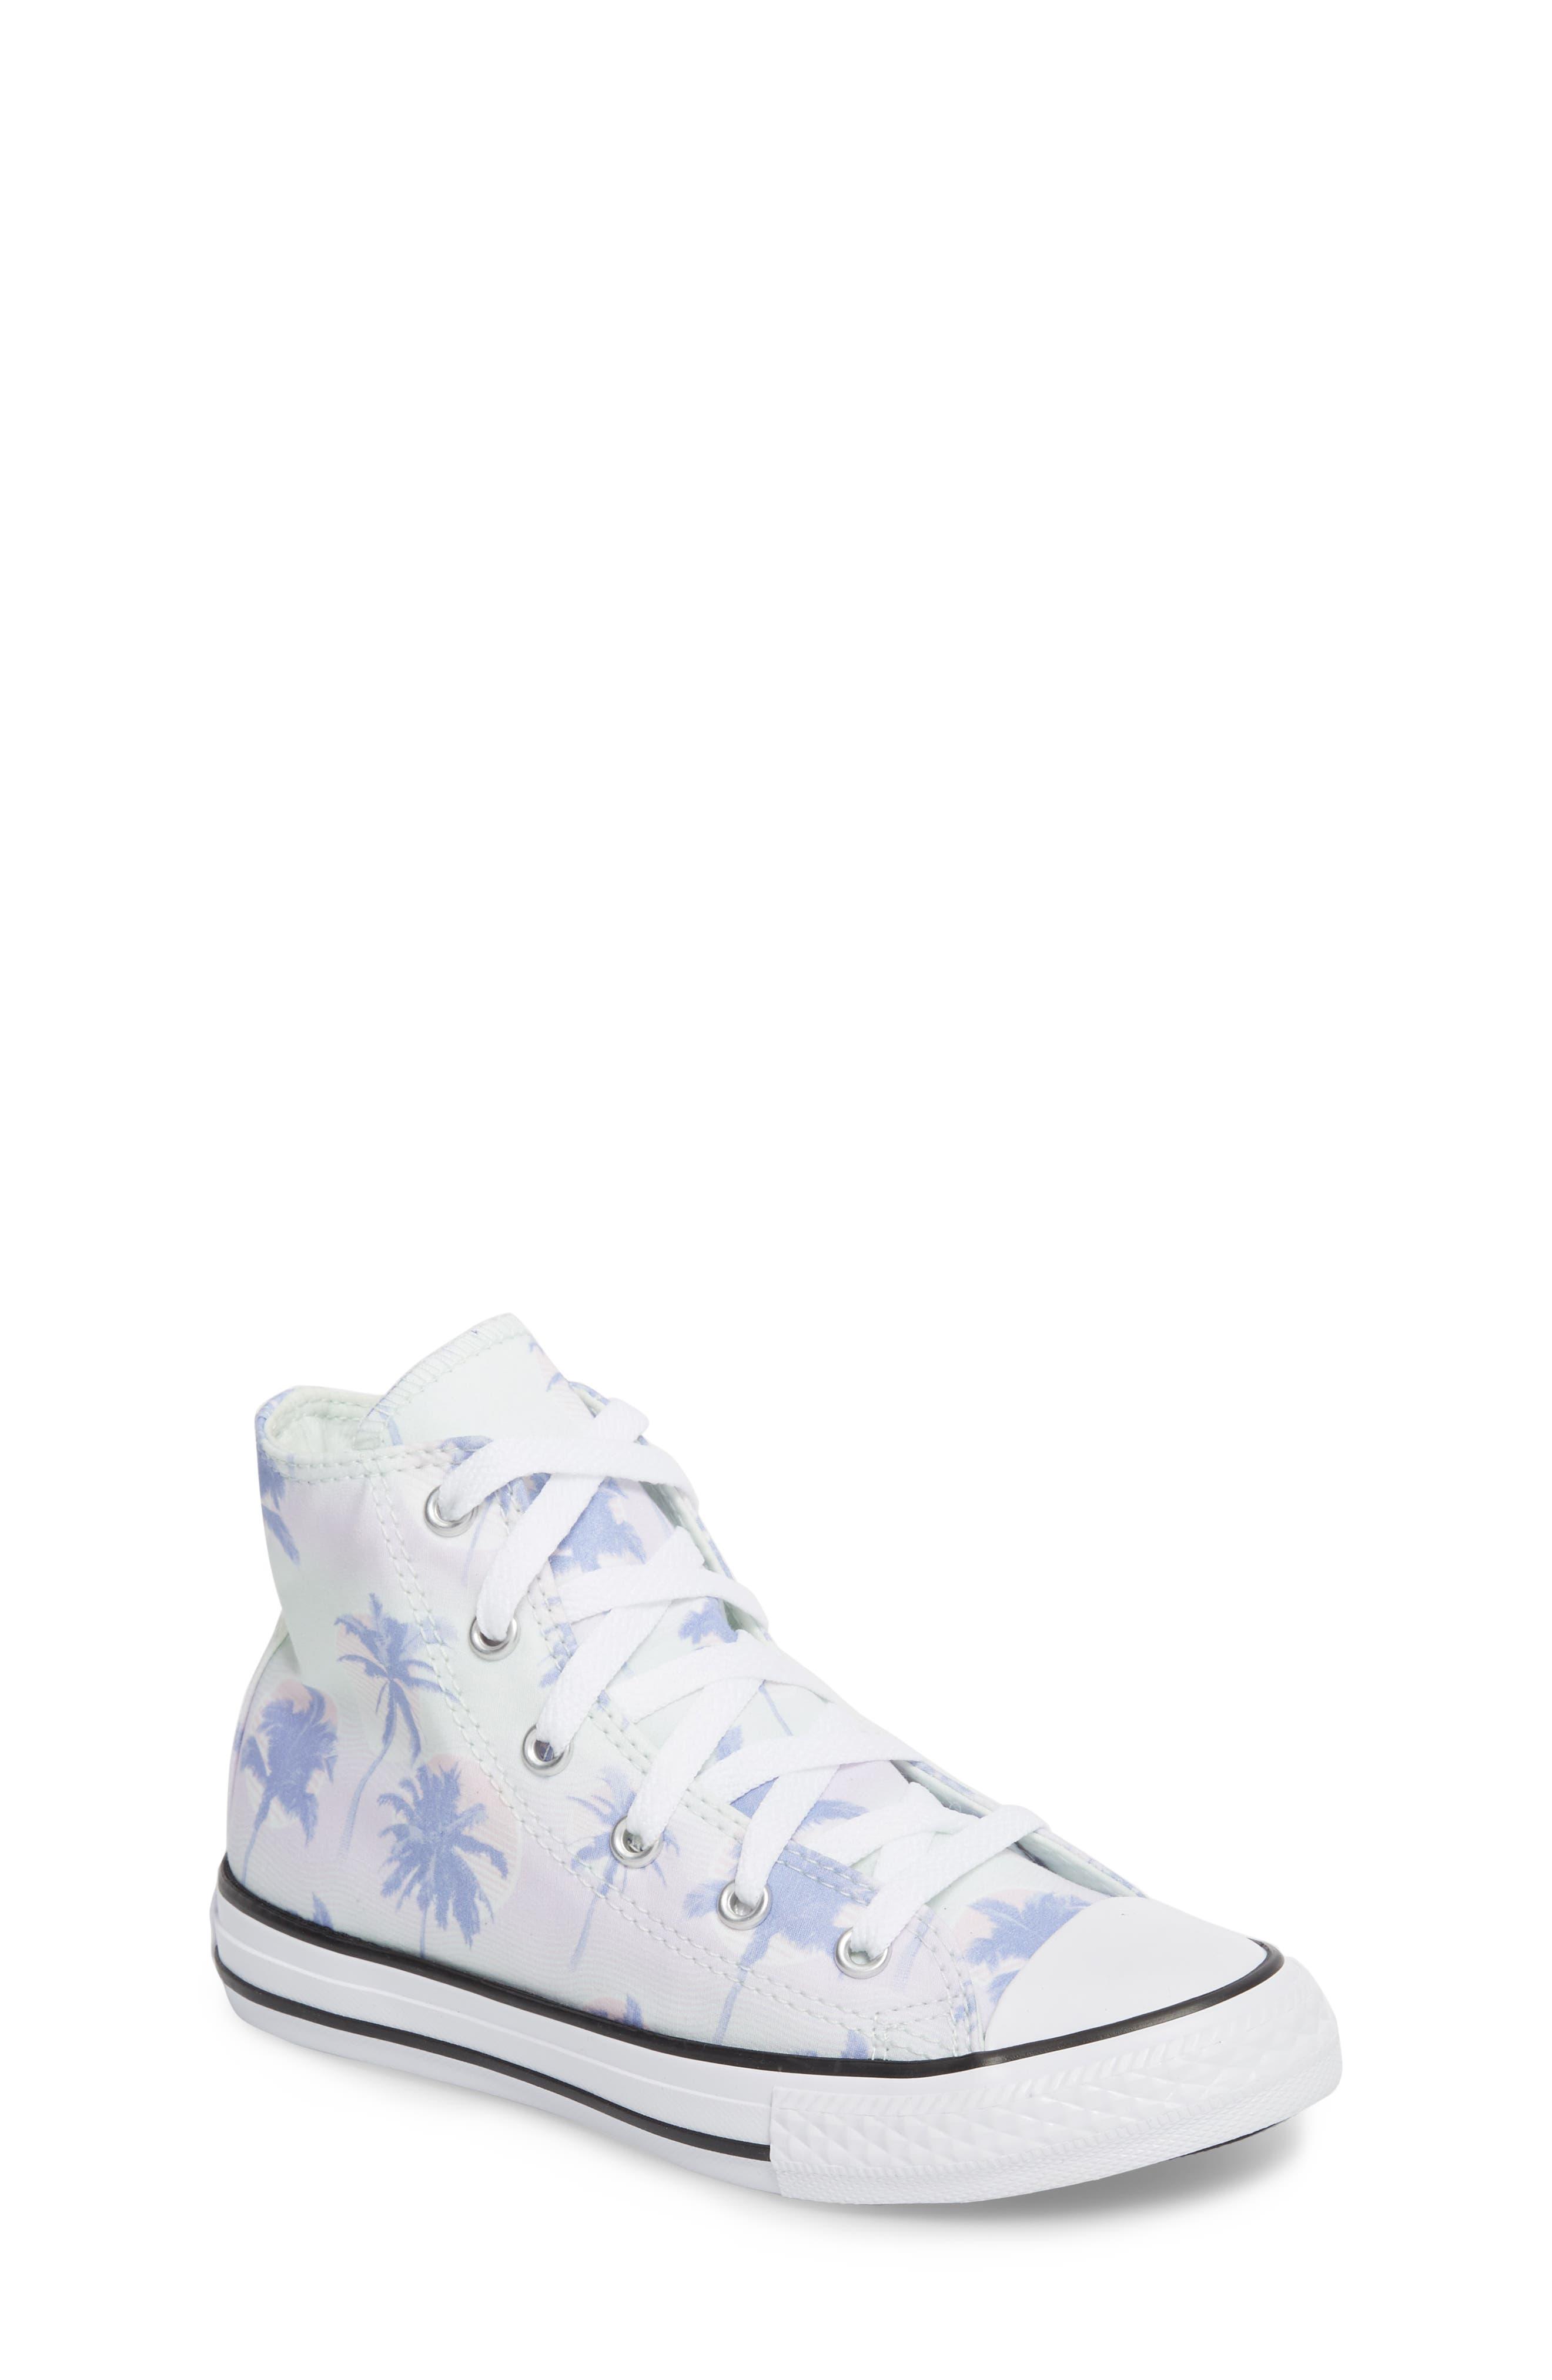 Converse Chuck Taylor® All Star® Palm Tree High Top Sneaker (Toddler, Little Kid & Big Kid)